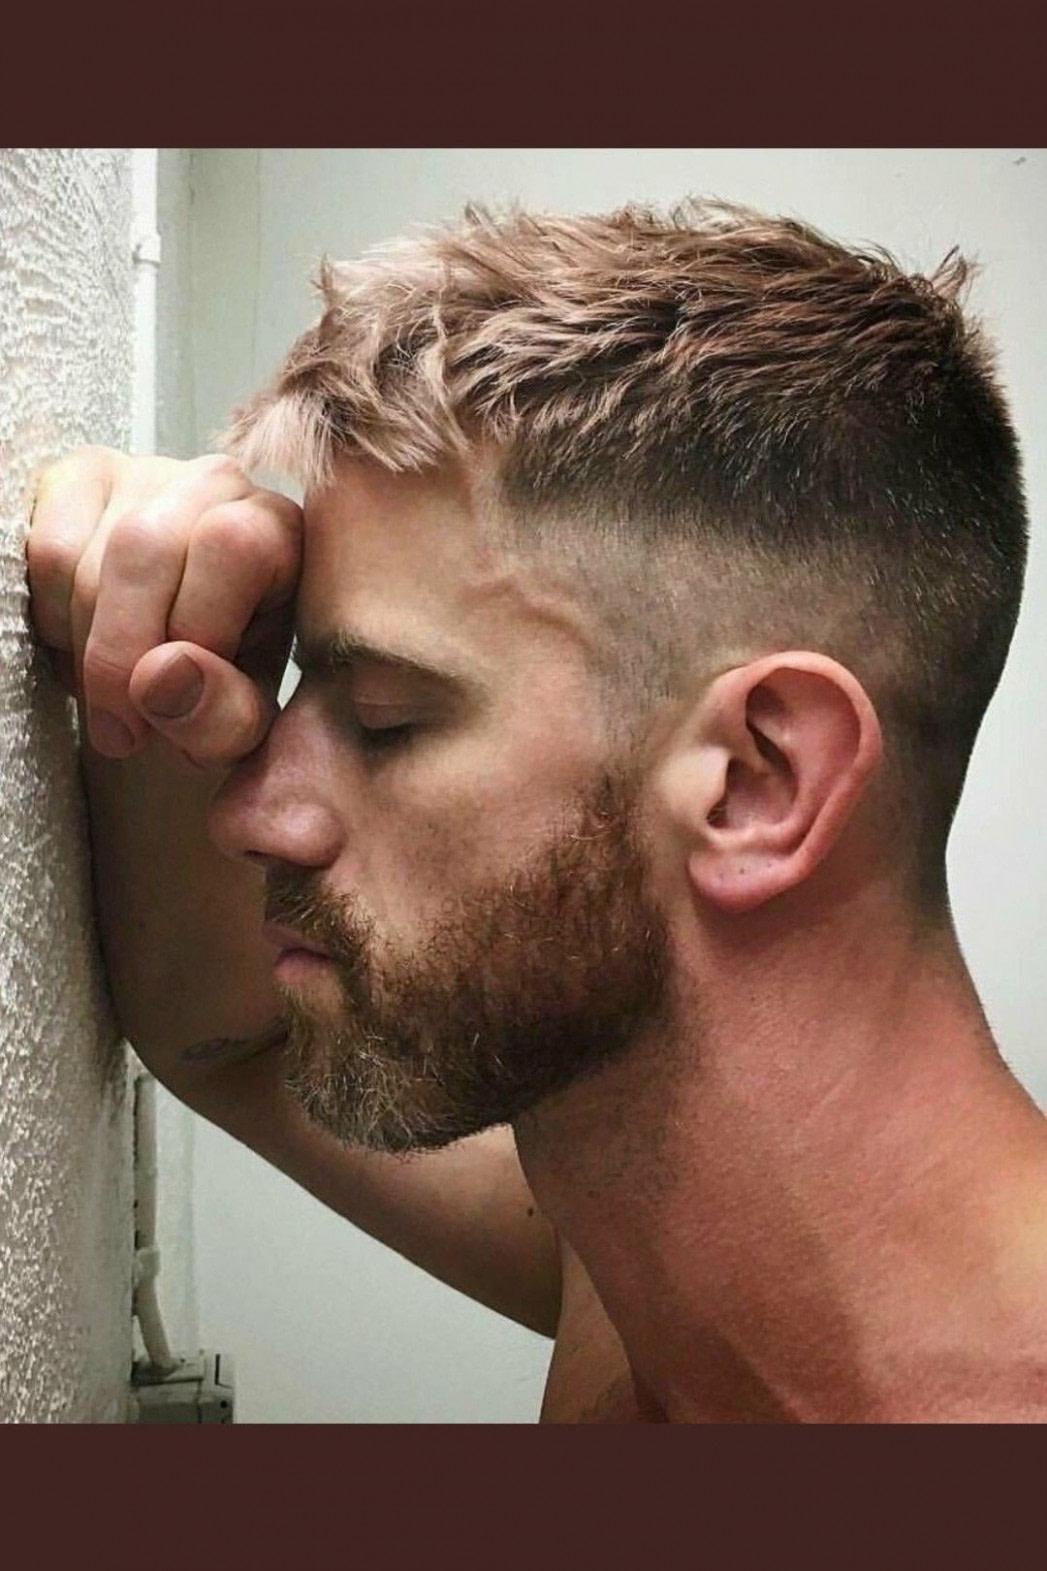 schönheit frisur ideen männer bilder - männer frisuren trend